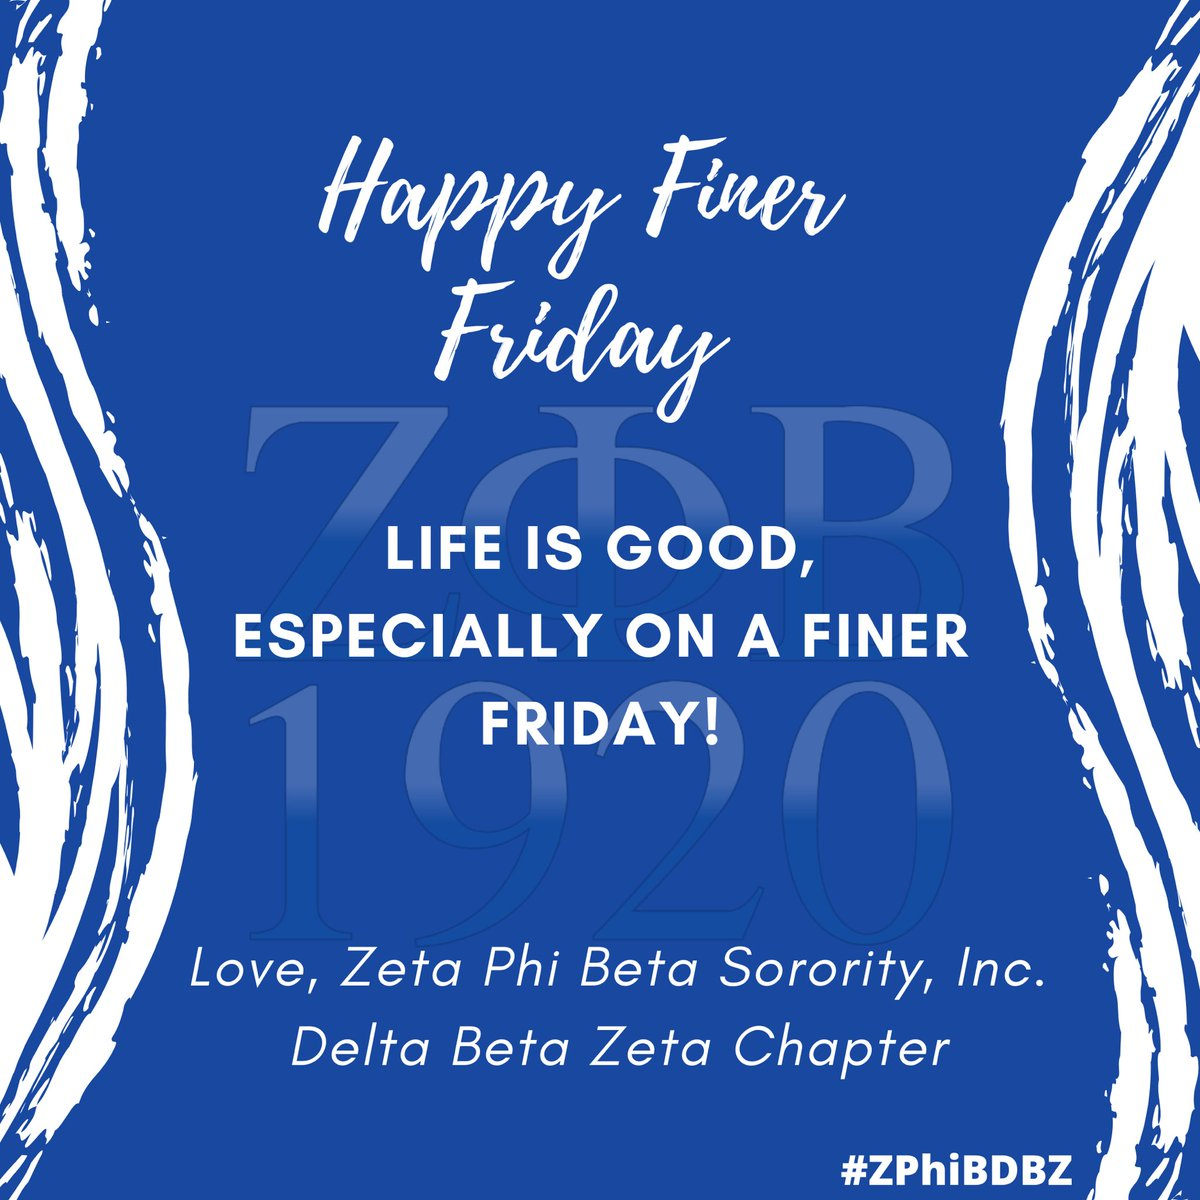 Happy Finer Friday from our family to yours! Have a wonderful blessed weekend! #zphib2020 #deltabetazetachapter #zphibdbz1957 #queenszetas #finerwomanhood #finergradzetas #zetaphibetasororityinc #zphibdbz #finerfridays #finerfridaypic.twitter.com/lLdXyQi0RF